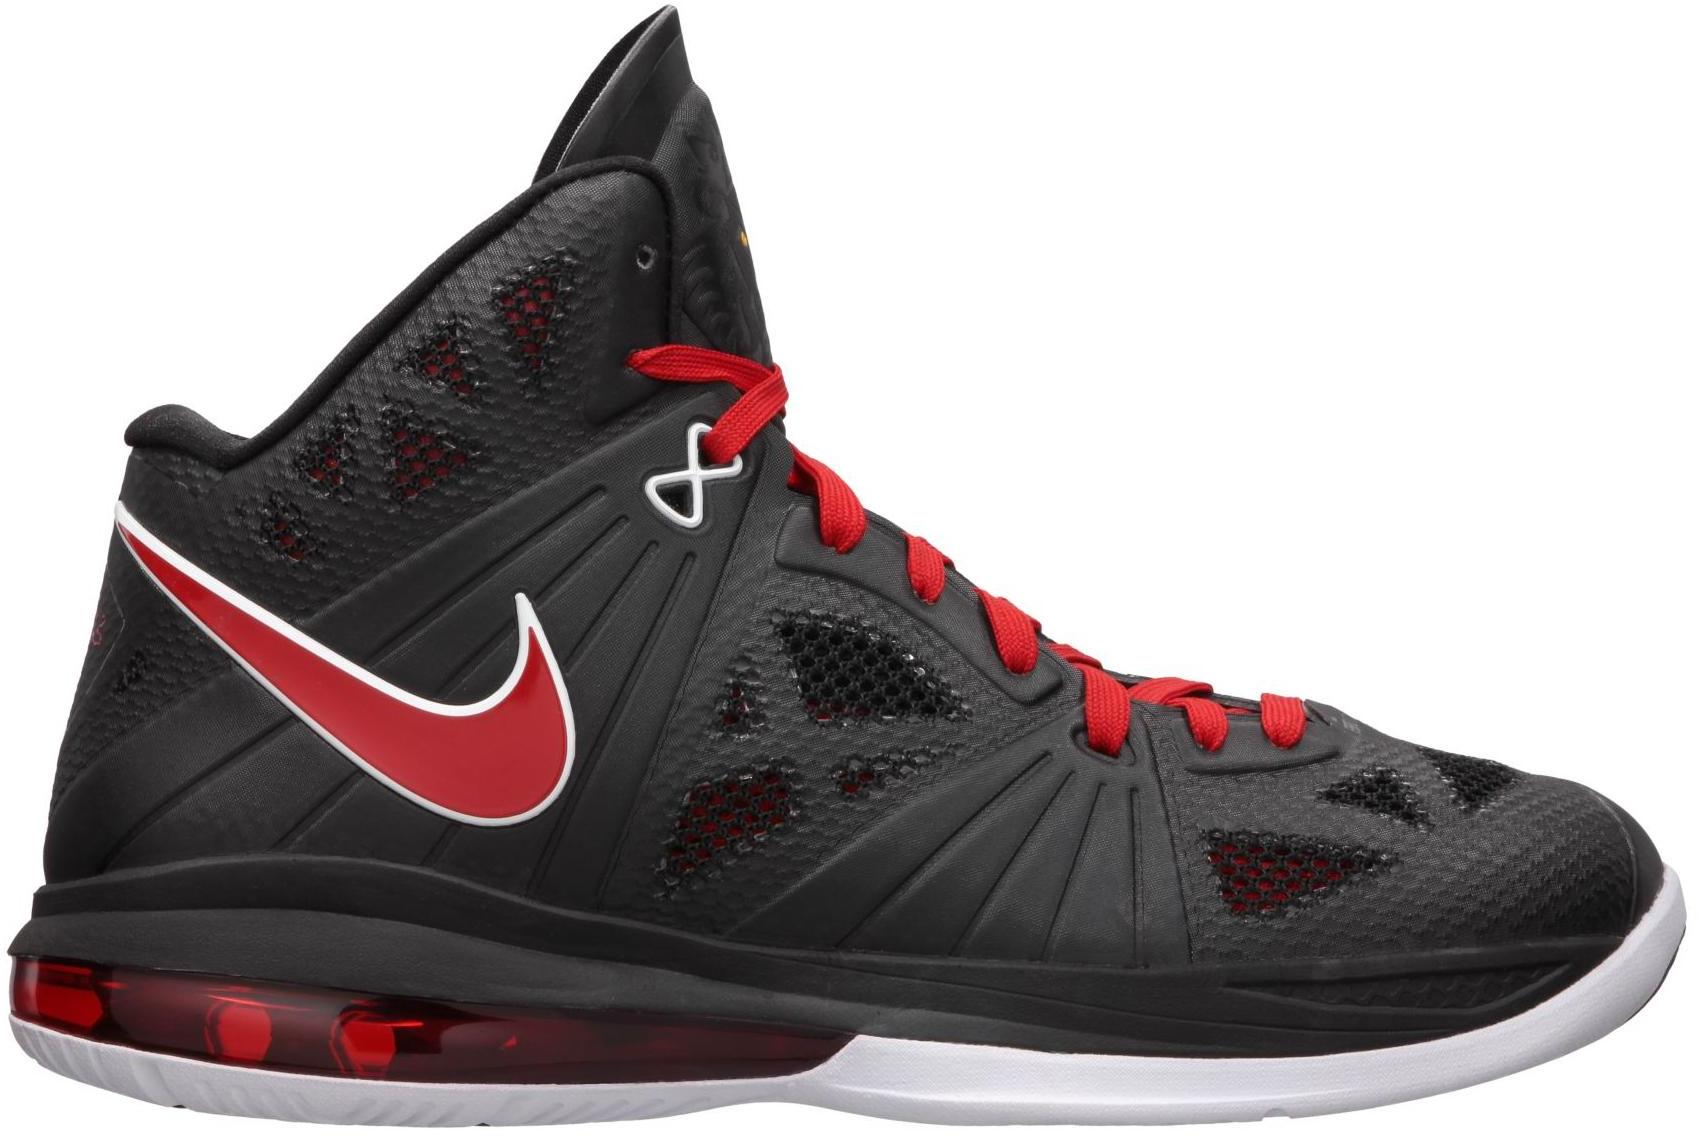 Nike LeBron 8 PS White/Black/Red